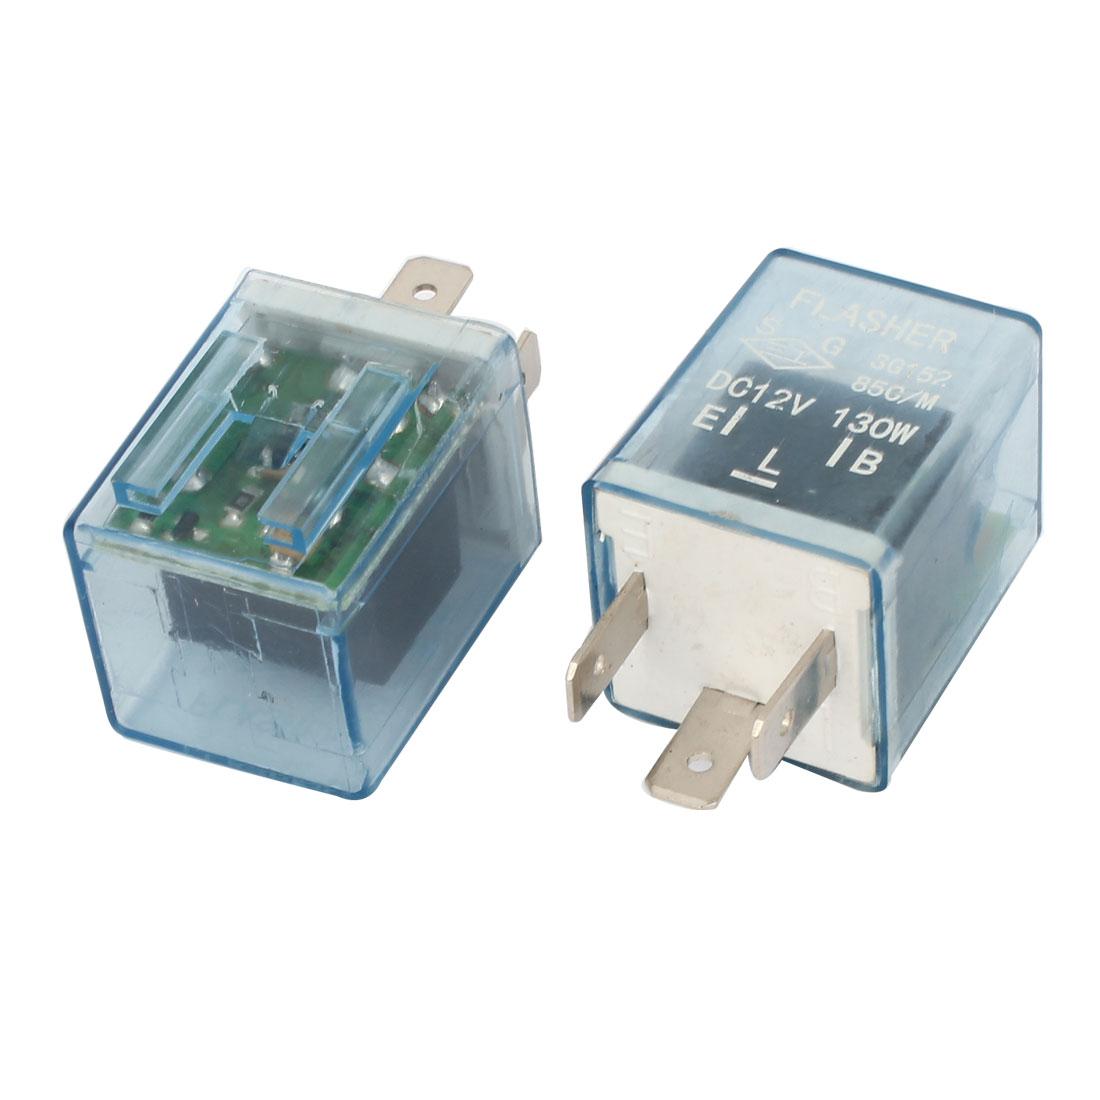 2 Pcs DC 24V 130 Electronic LED Light Clear Plastic Car Flasher Relay